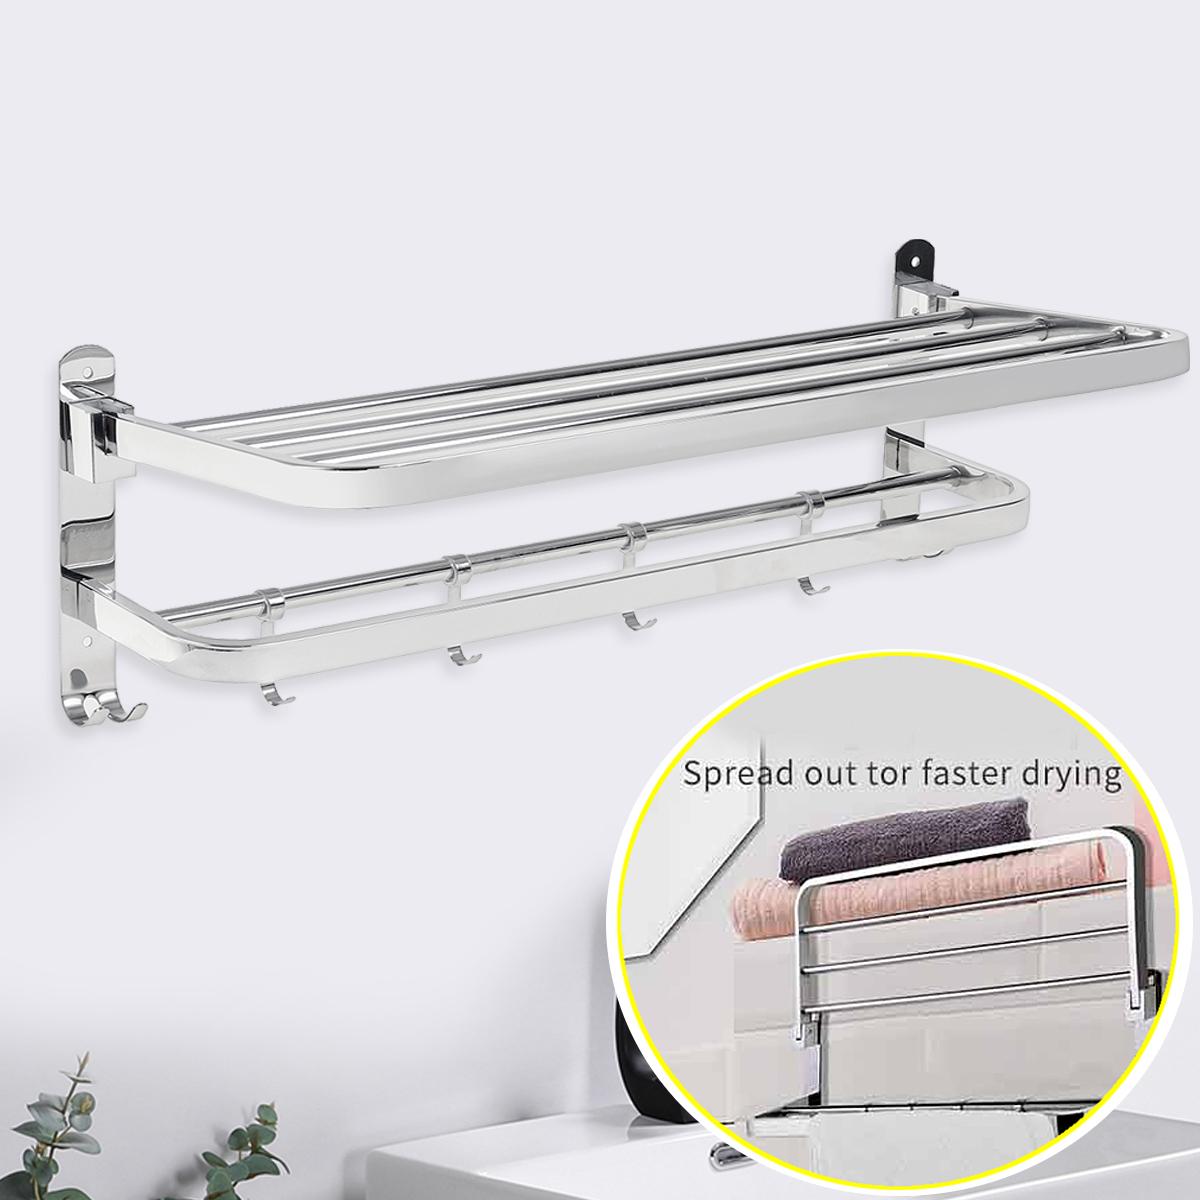 stainless steel double towel bar bathroom wall shelves towel holders bath towel rack heavy duty wall mount coat hanging rack